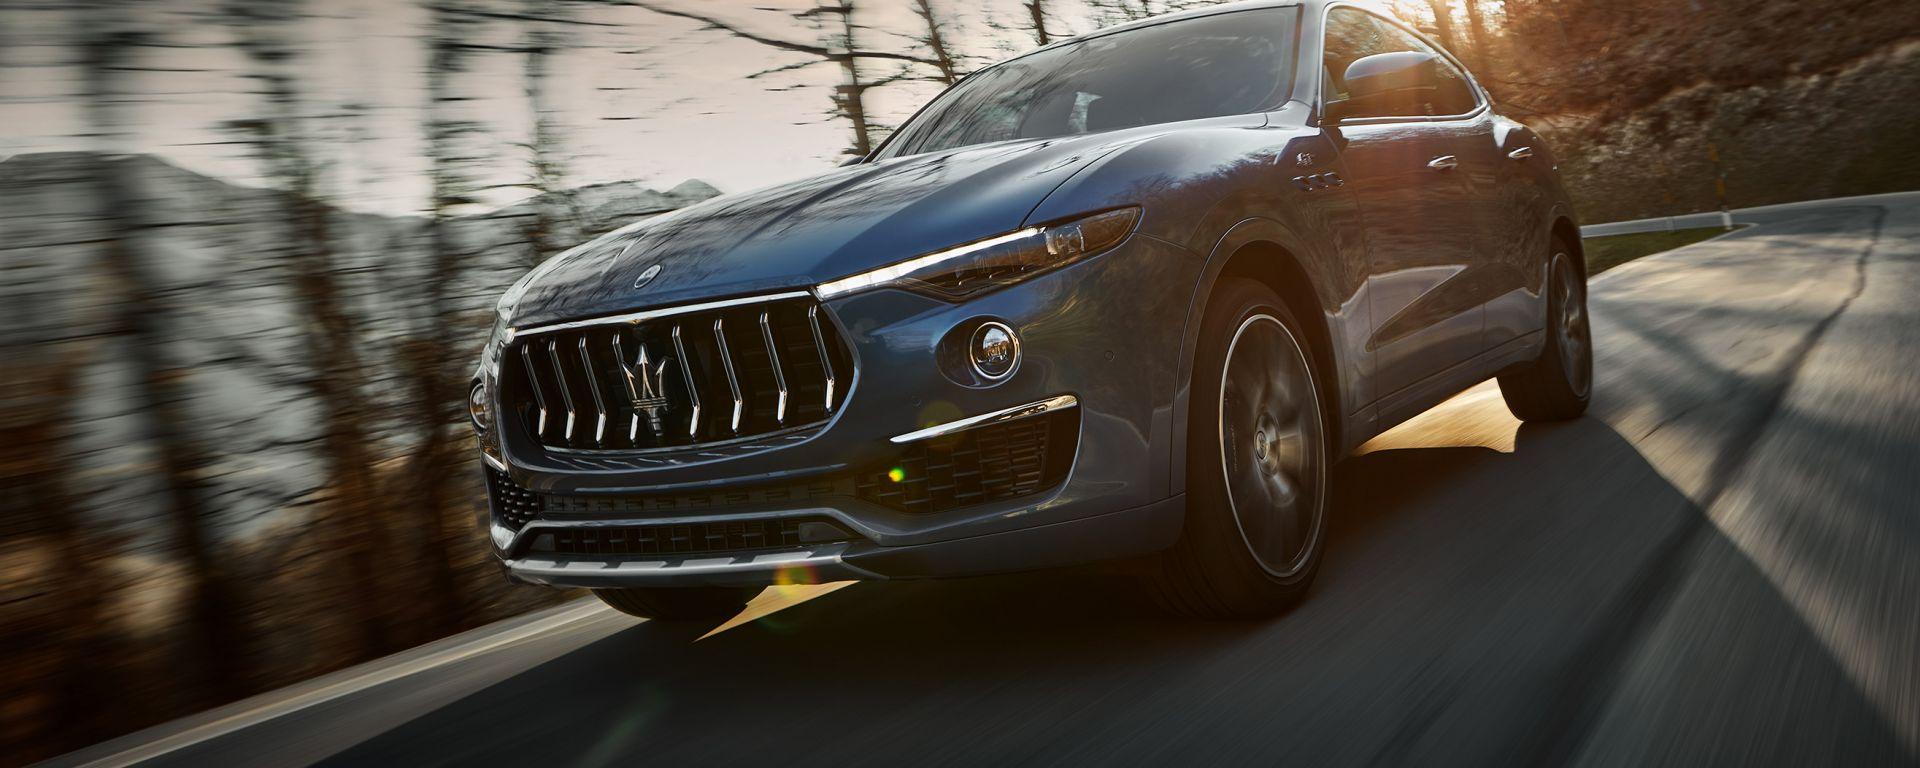 Nuova Maserati Levante Hybrid